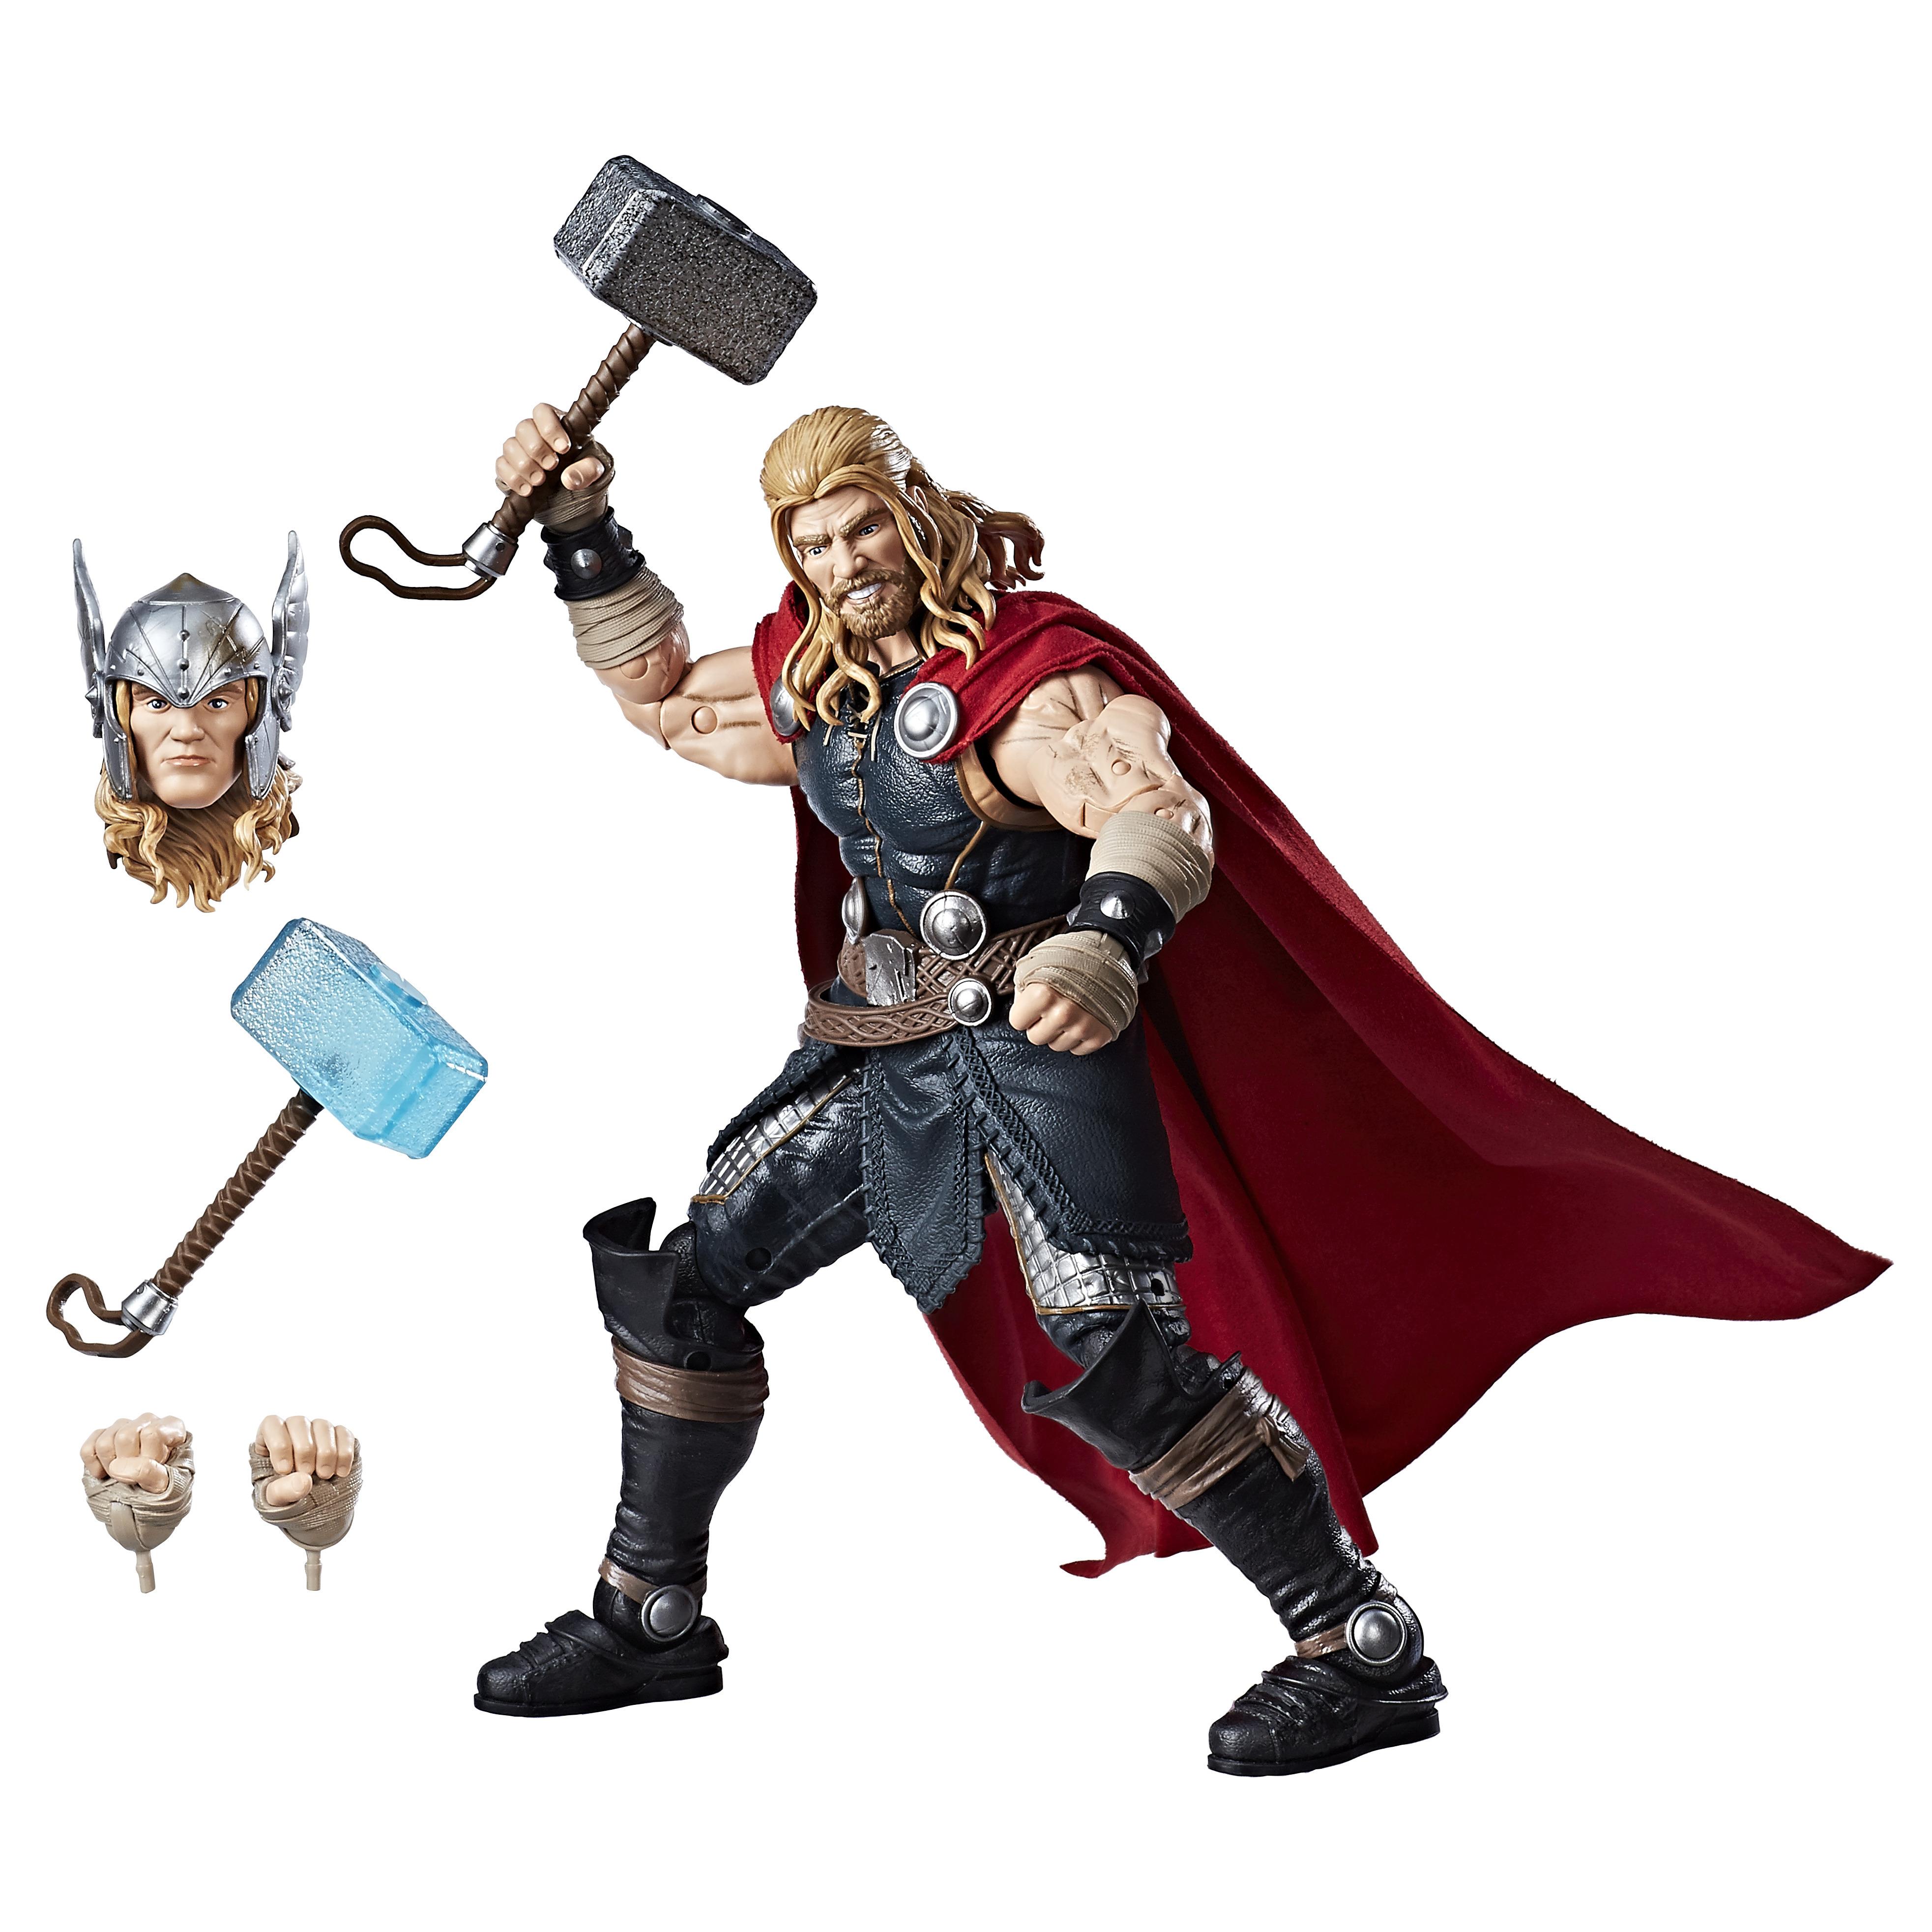 Titan Legends Marvel Marvel Avengers Thor C1879EU40 08wmNn